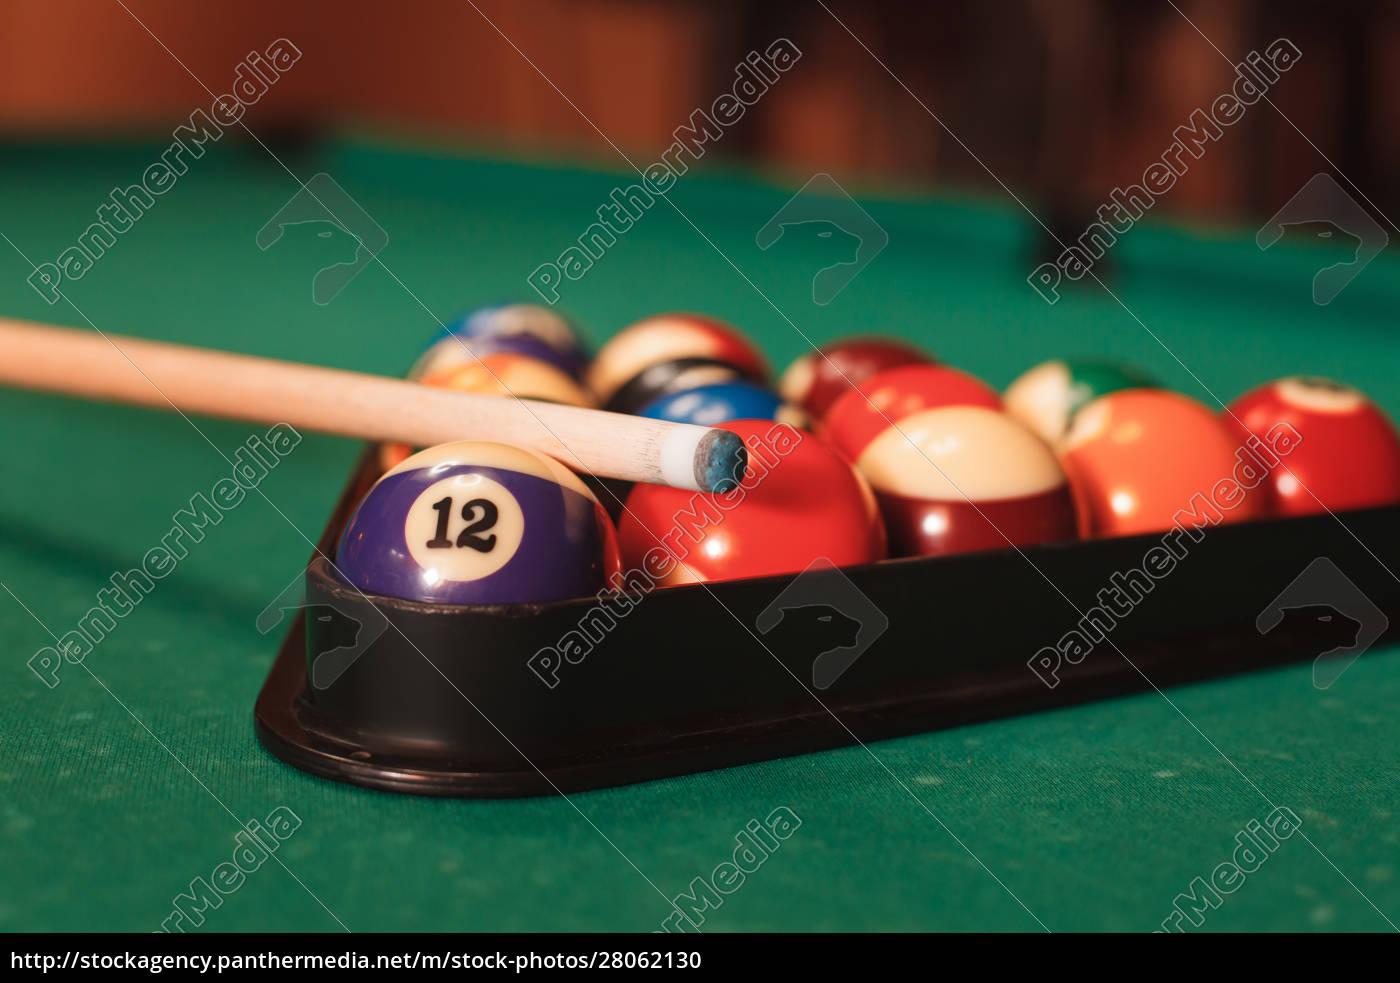 billiard, balls, near, by, cue, and - 28062130